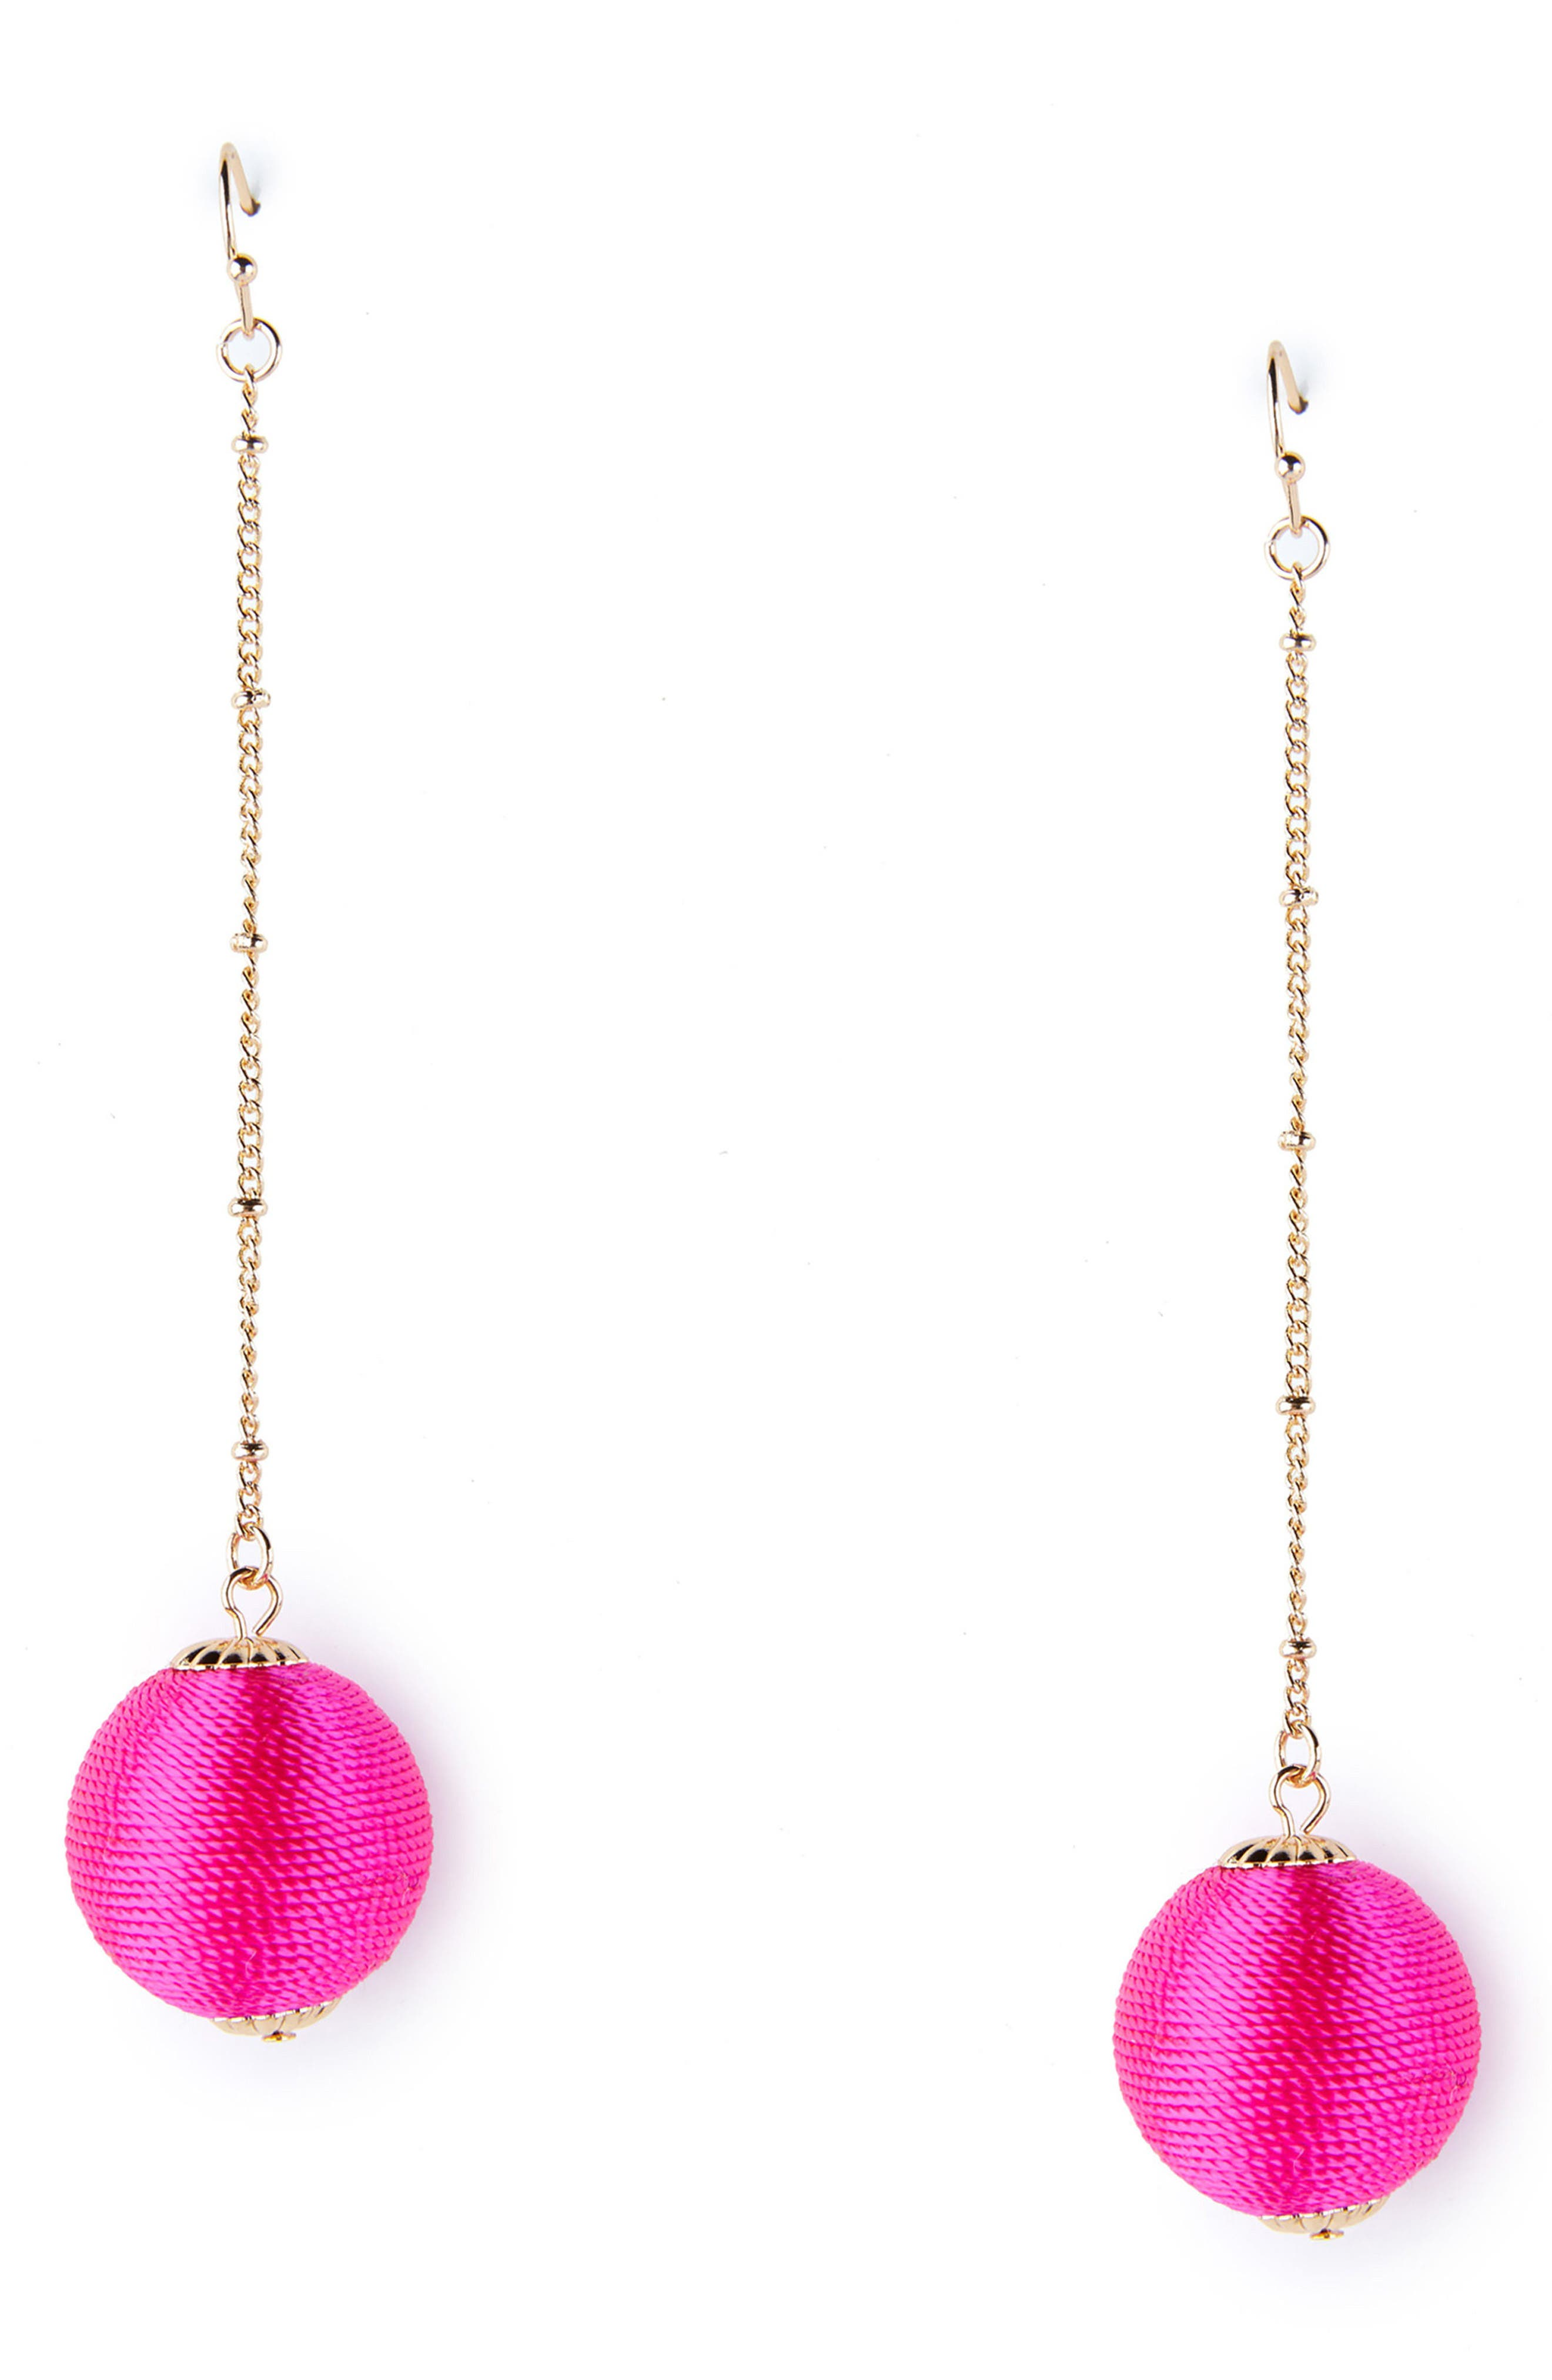 Floating Sphere Drop Earrings,                             Main thumbnail 1, color,                             620